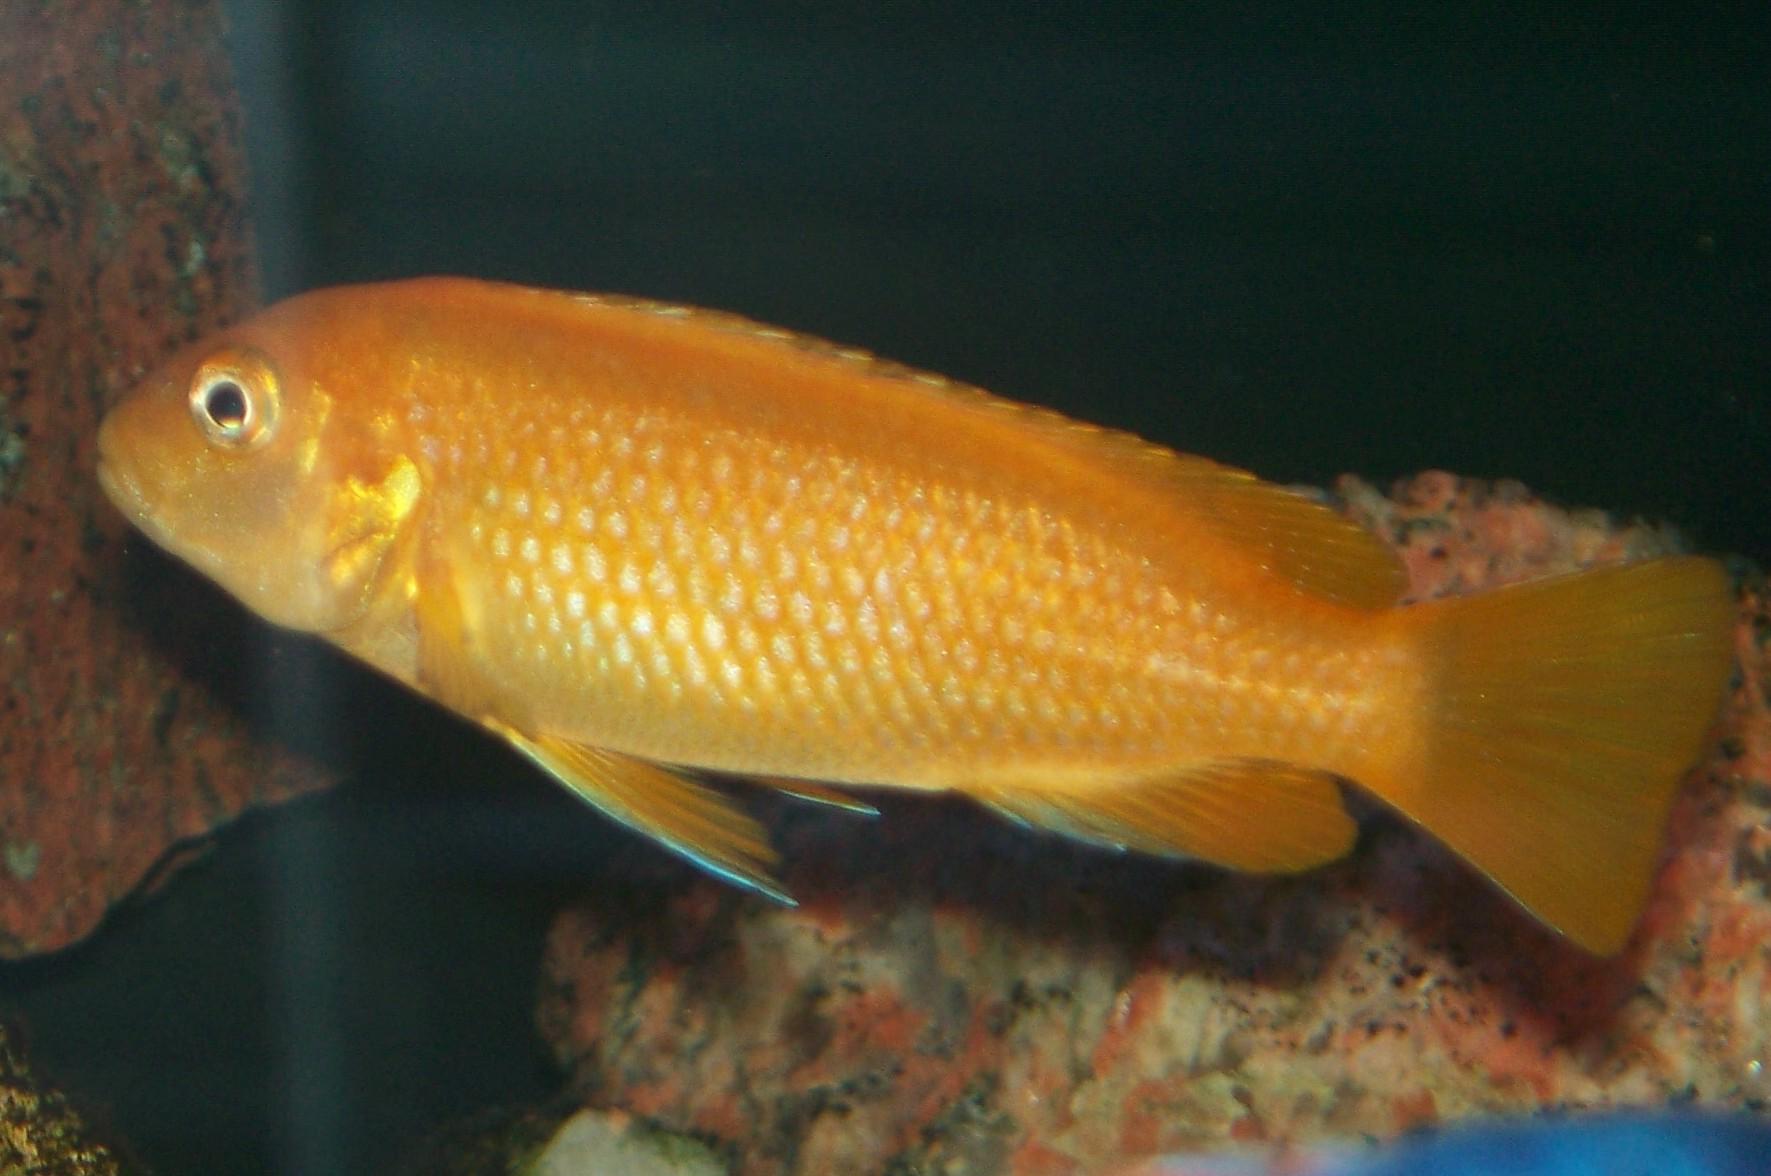 cichlids.com: Female Johanni Gome.